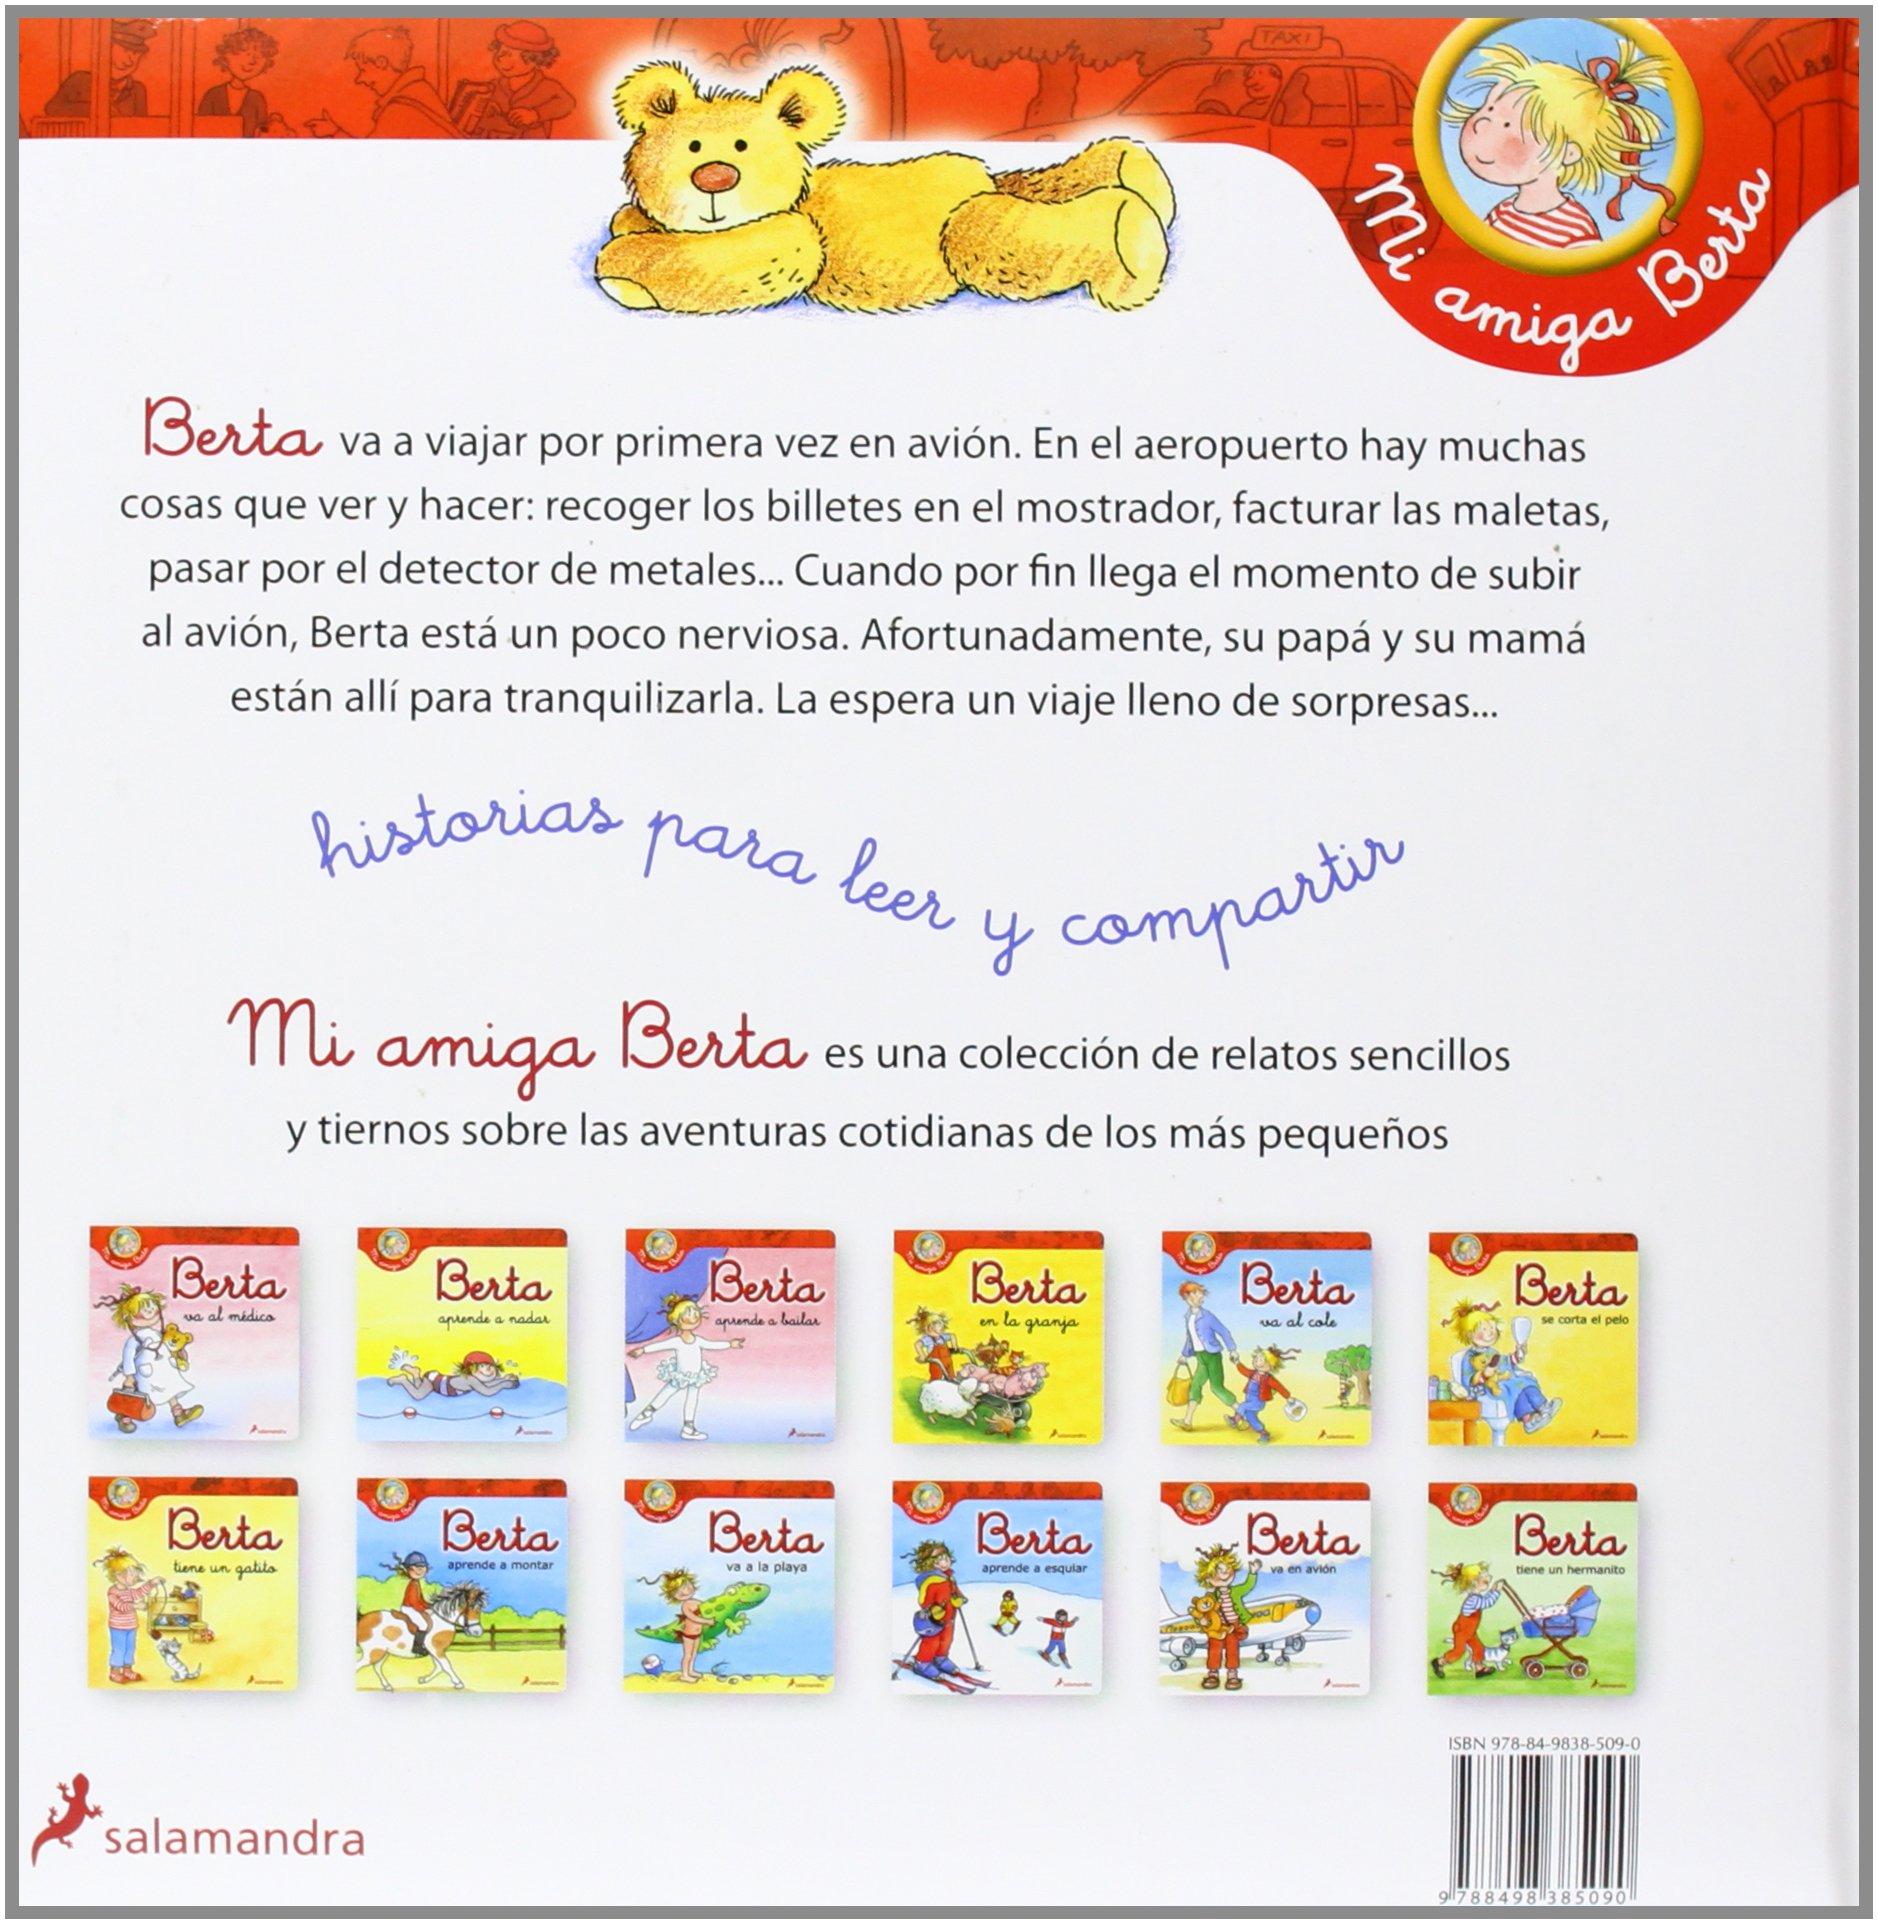 Berta va en avion (My Friend Berta) (Spanish Edition): Liane Schneider: 9788498385090: Amazon.com: Books